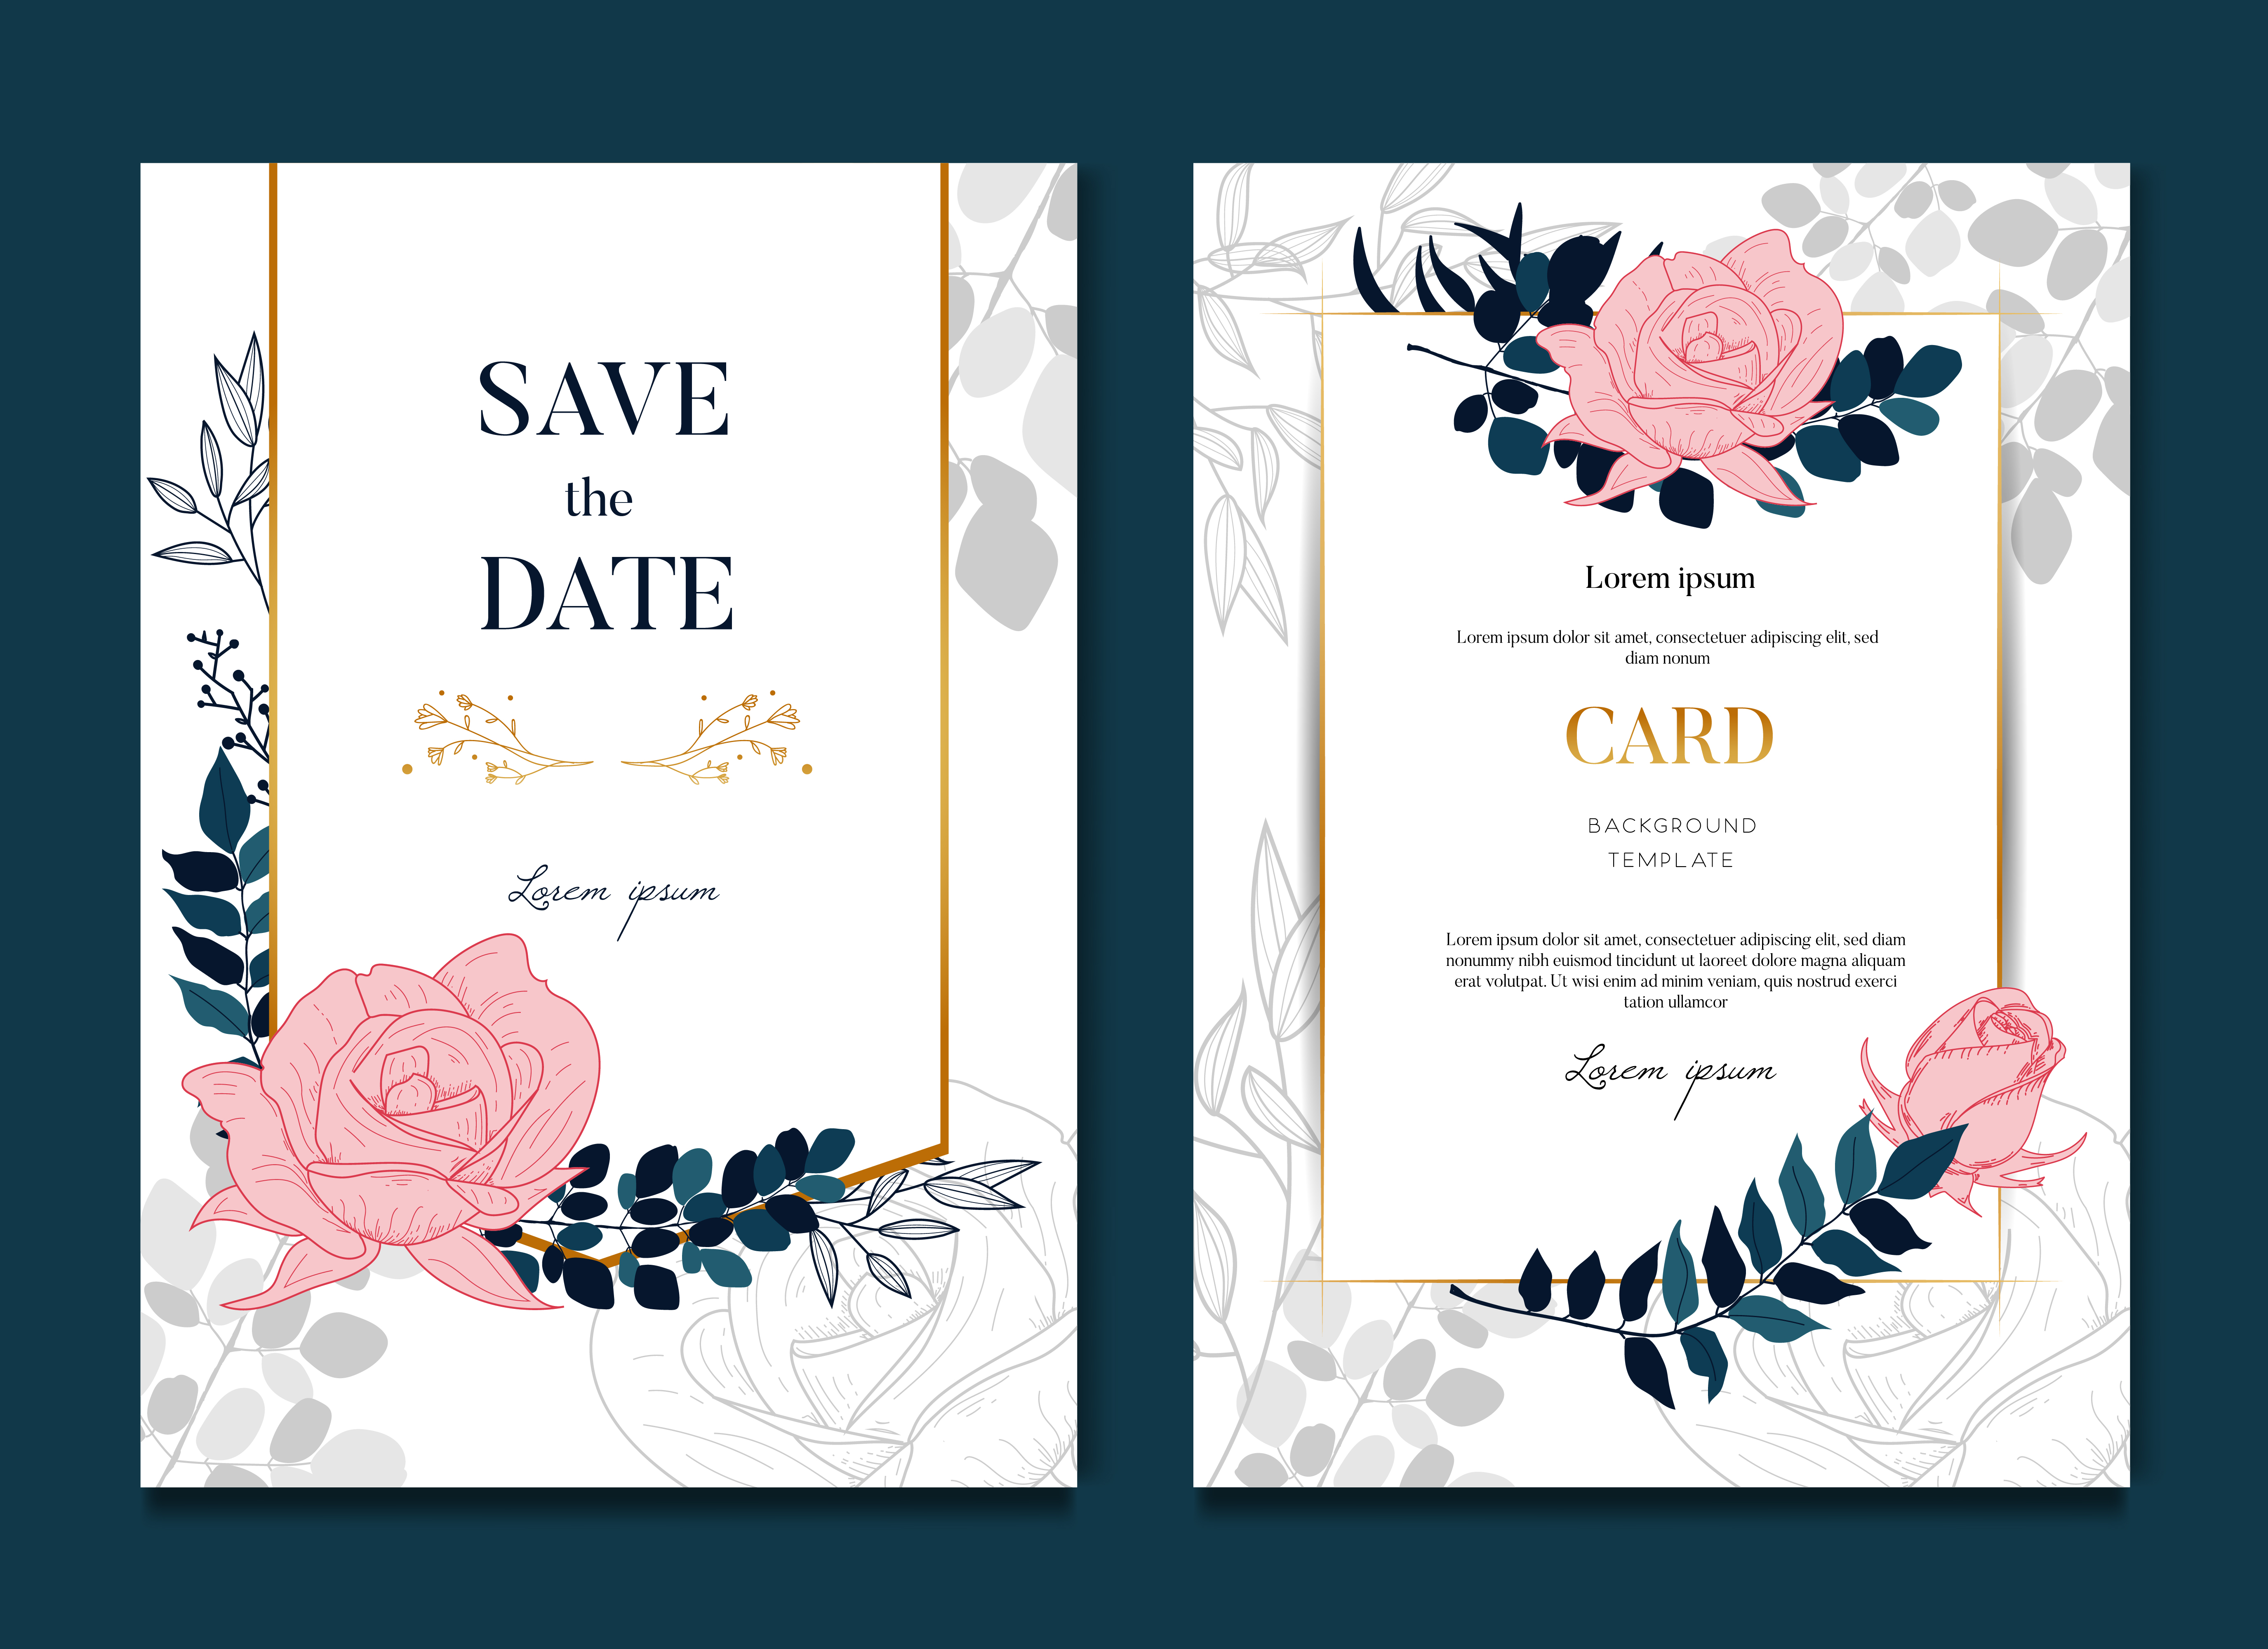 Simple Elegant Rose Wedding Frames Card And Invitation 602750 Download Free Vectors Clipart Graphics Vector Art